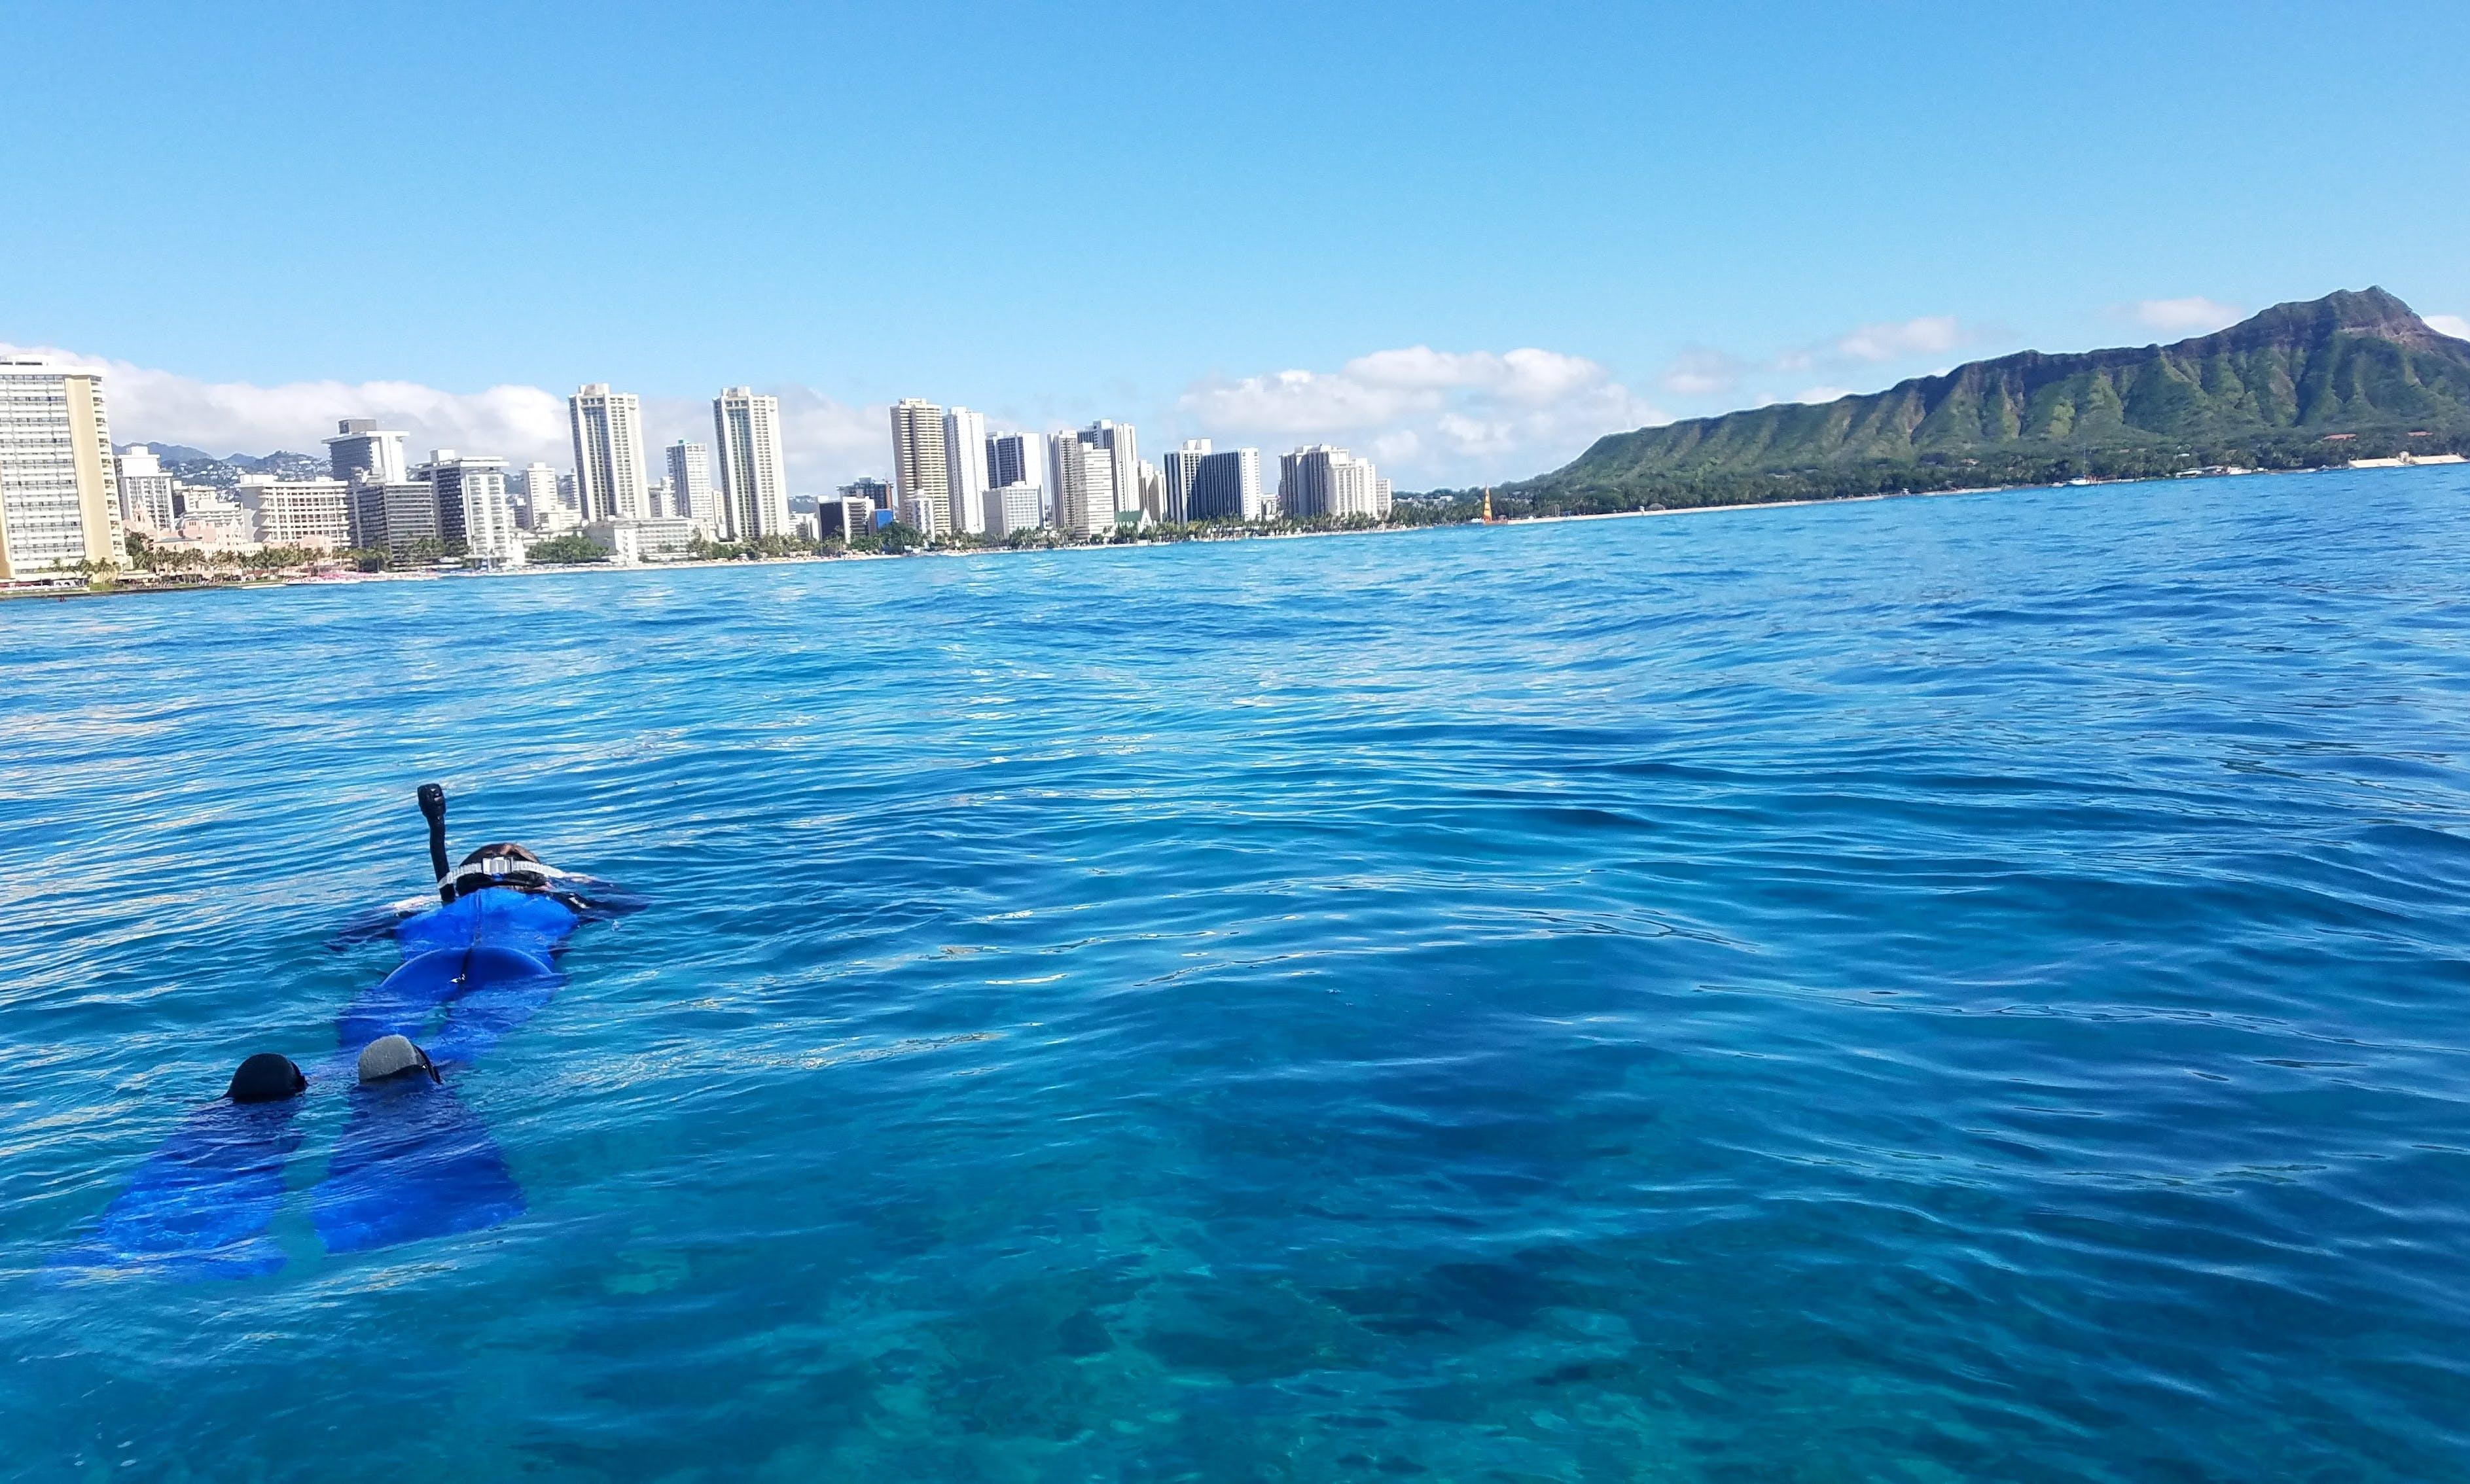 Lagoon 380 for Charter in Honolulu